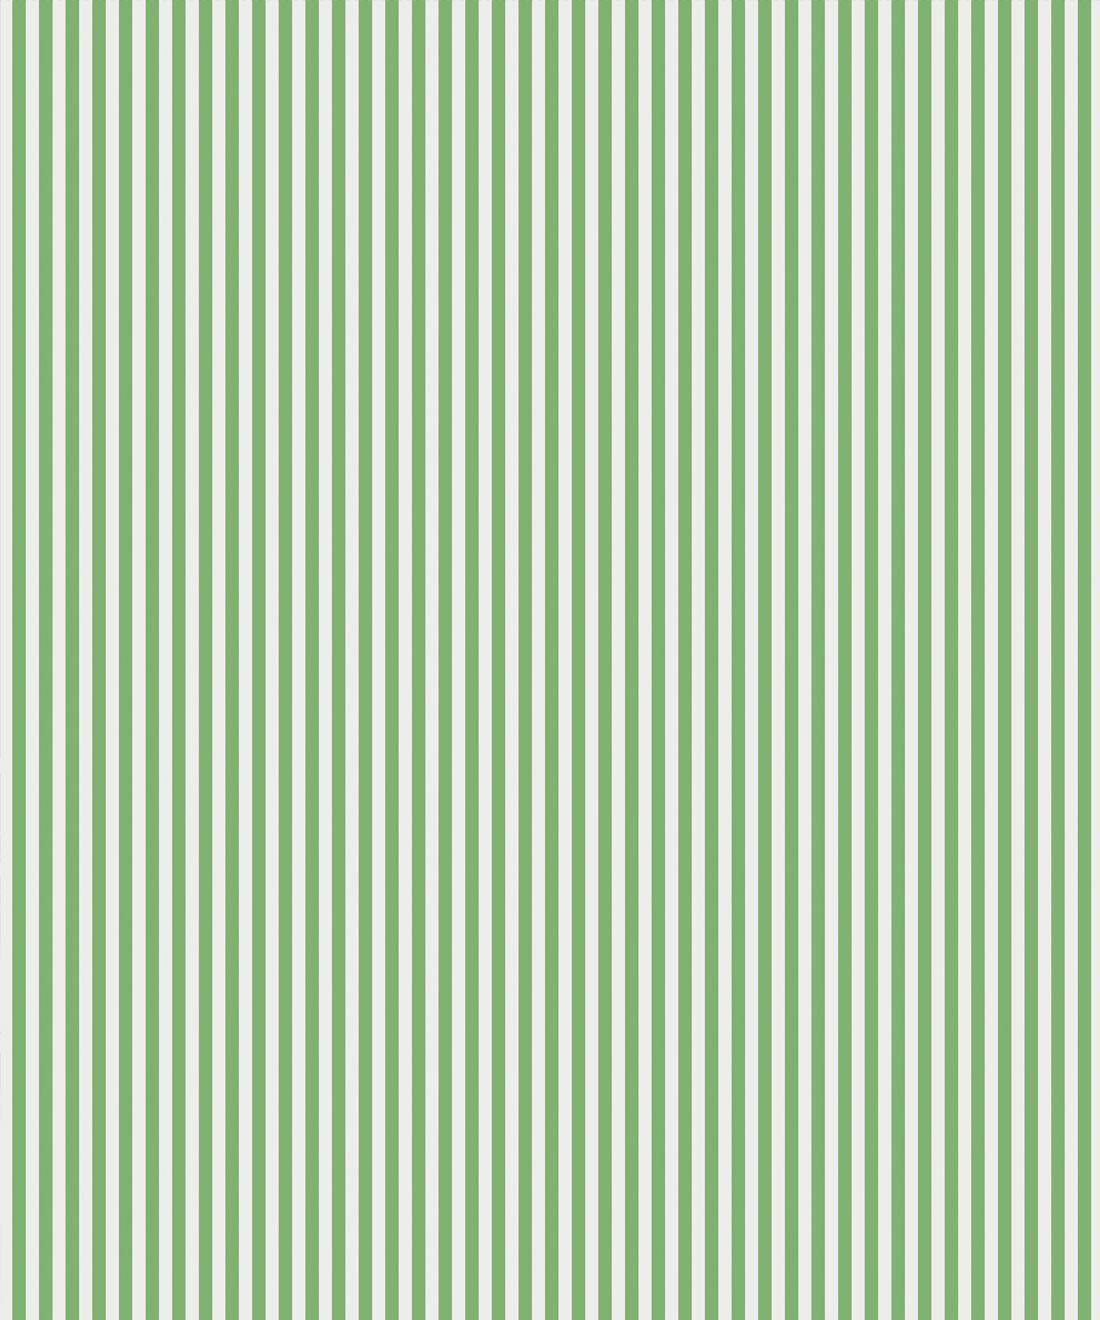 Candy Stripe Green